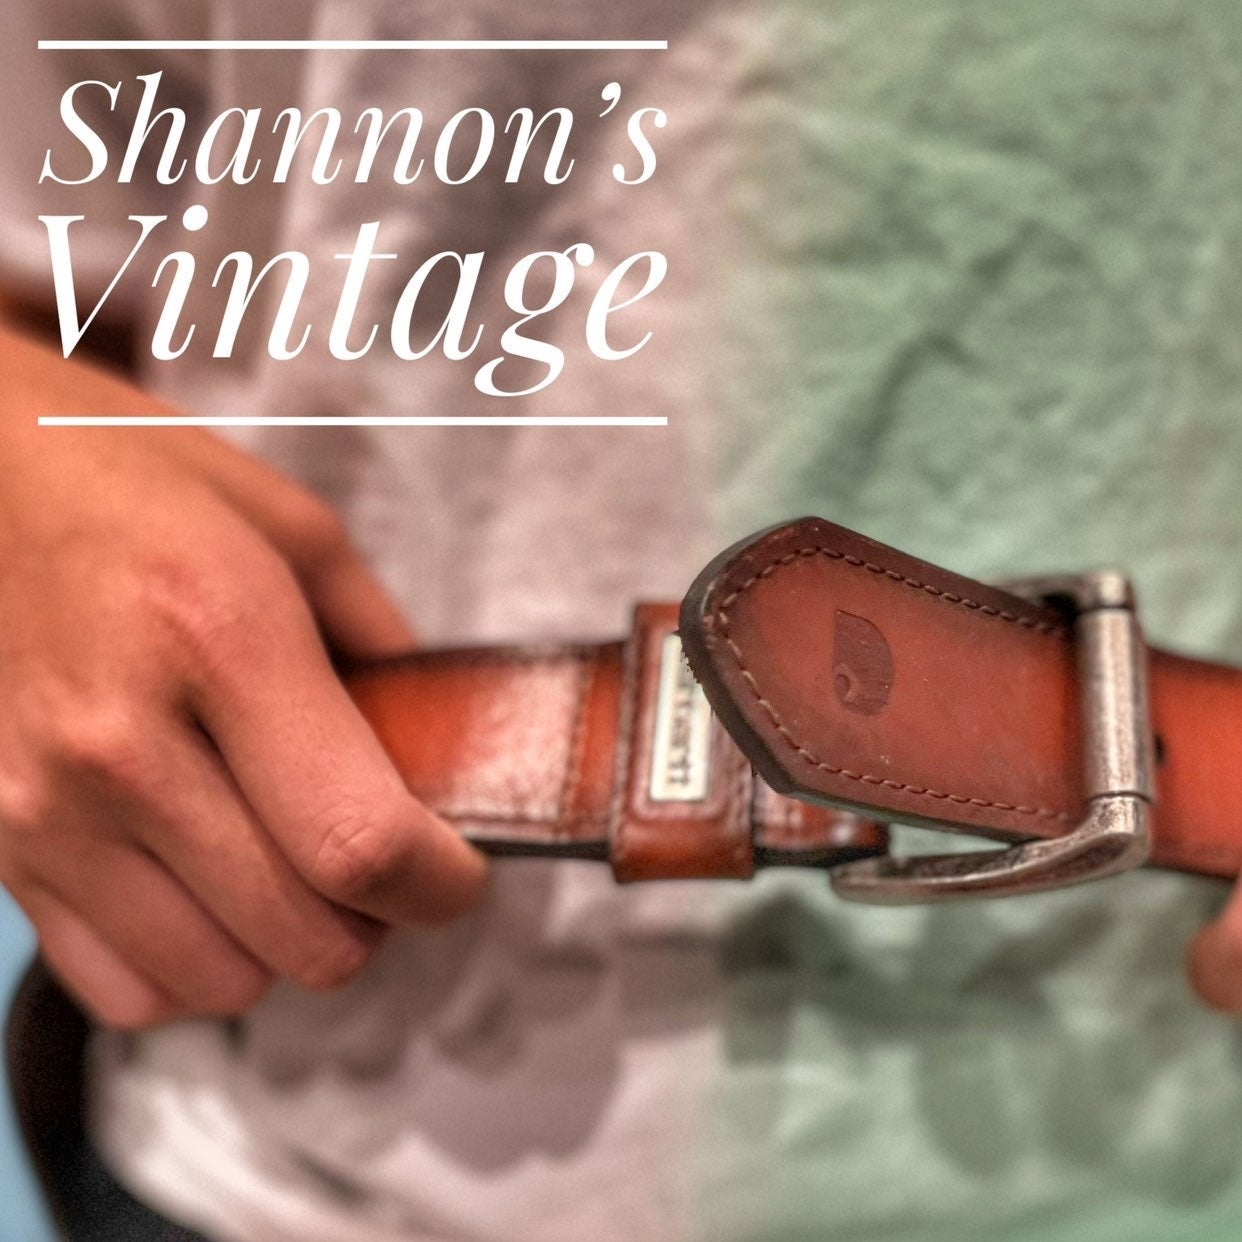 Carhartt sz 44 leather belt